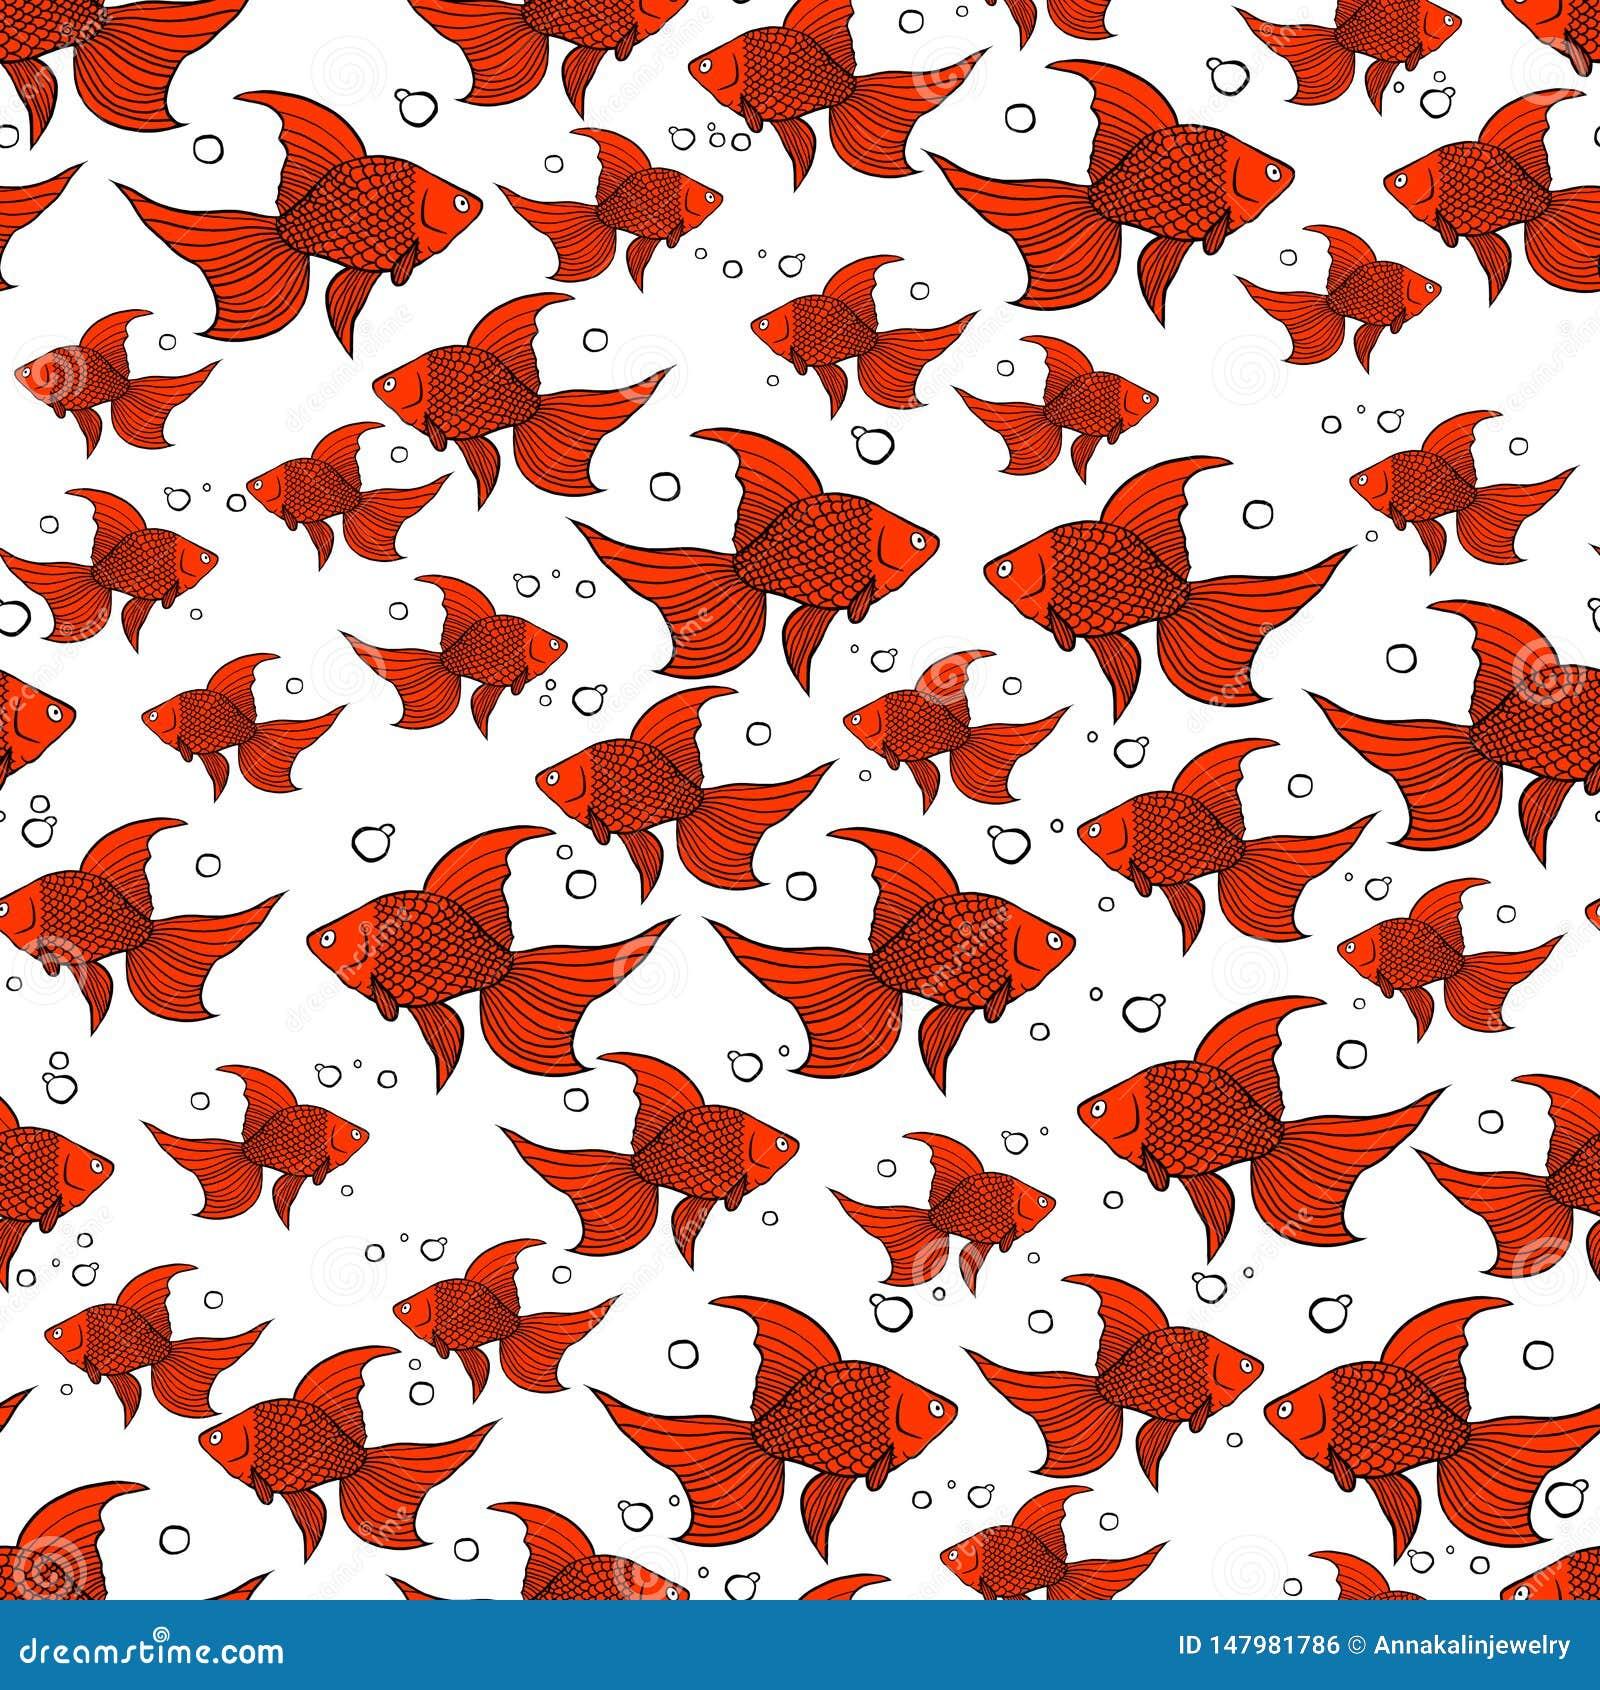 Seamless pattern with orange goldfish